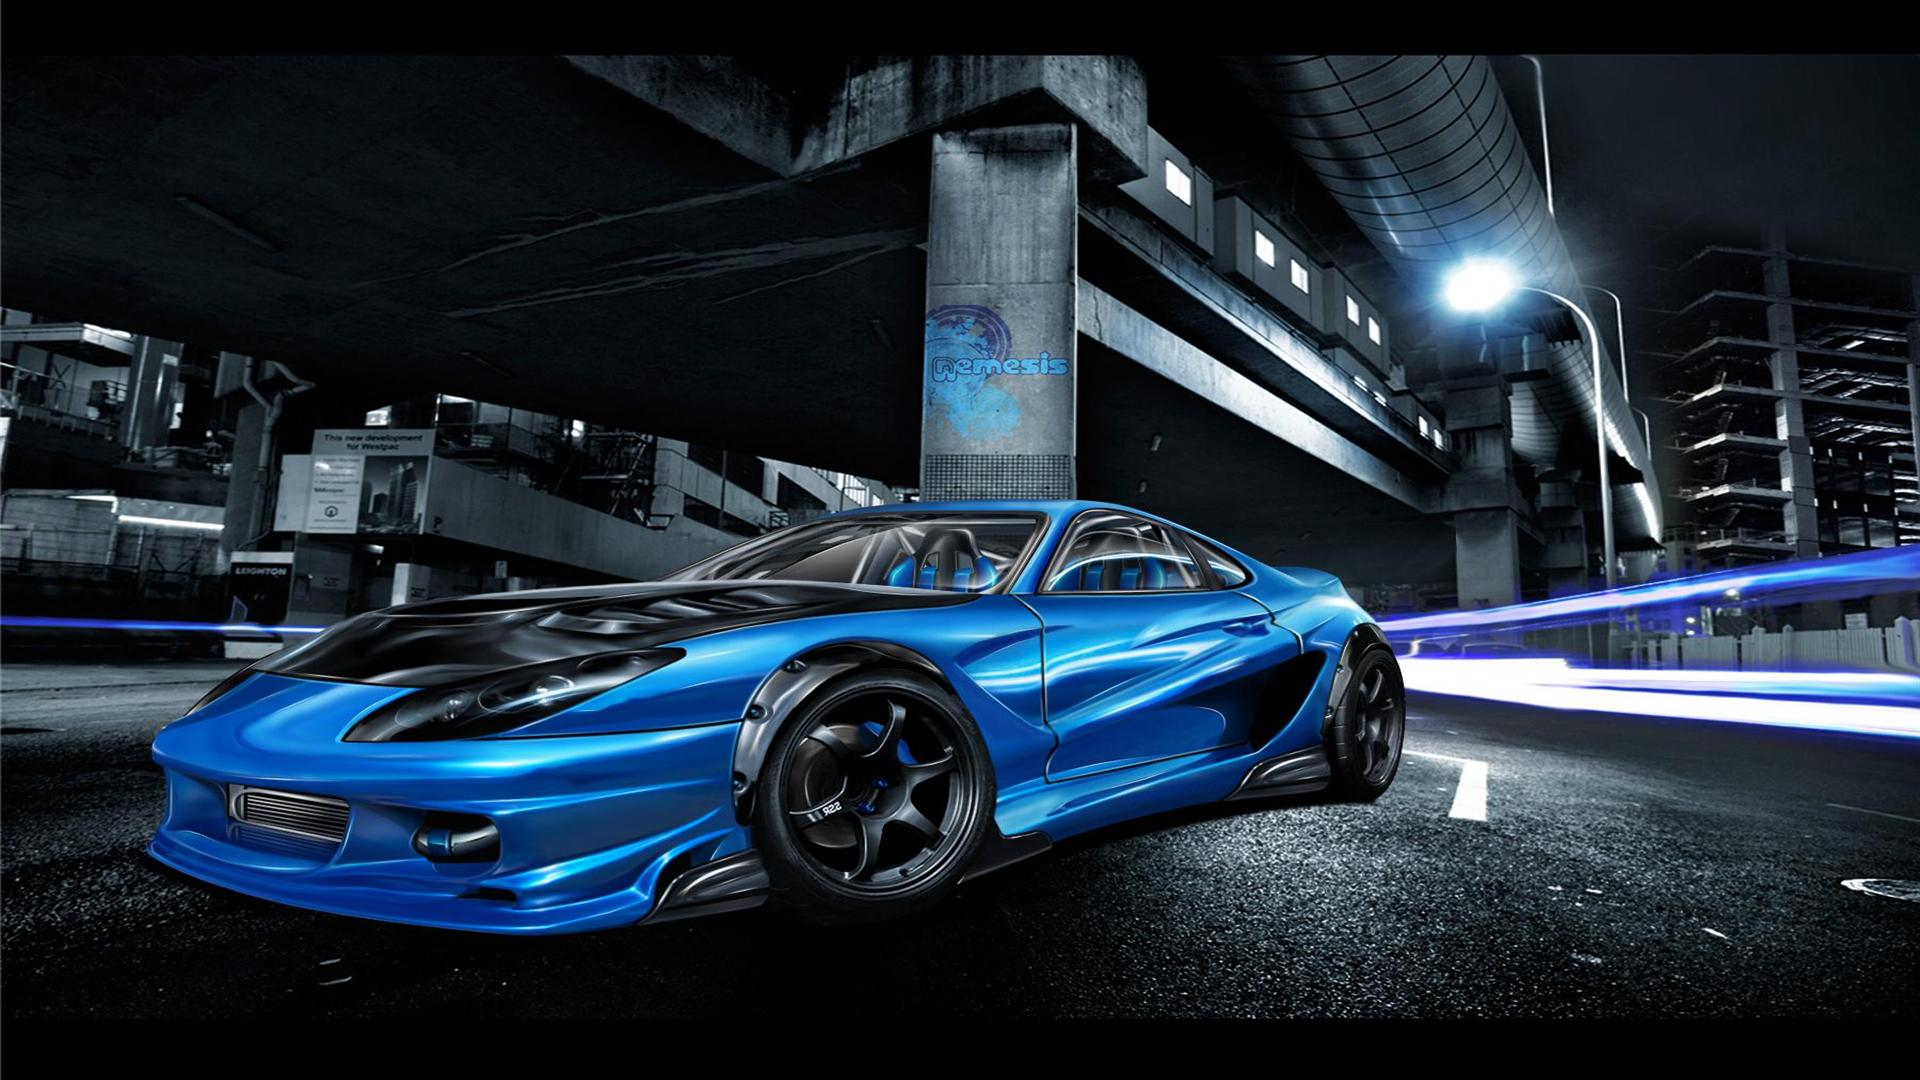 Blue Toyota Supra Wallpaper-1080p - My Site